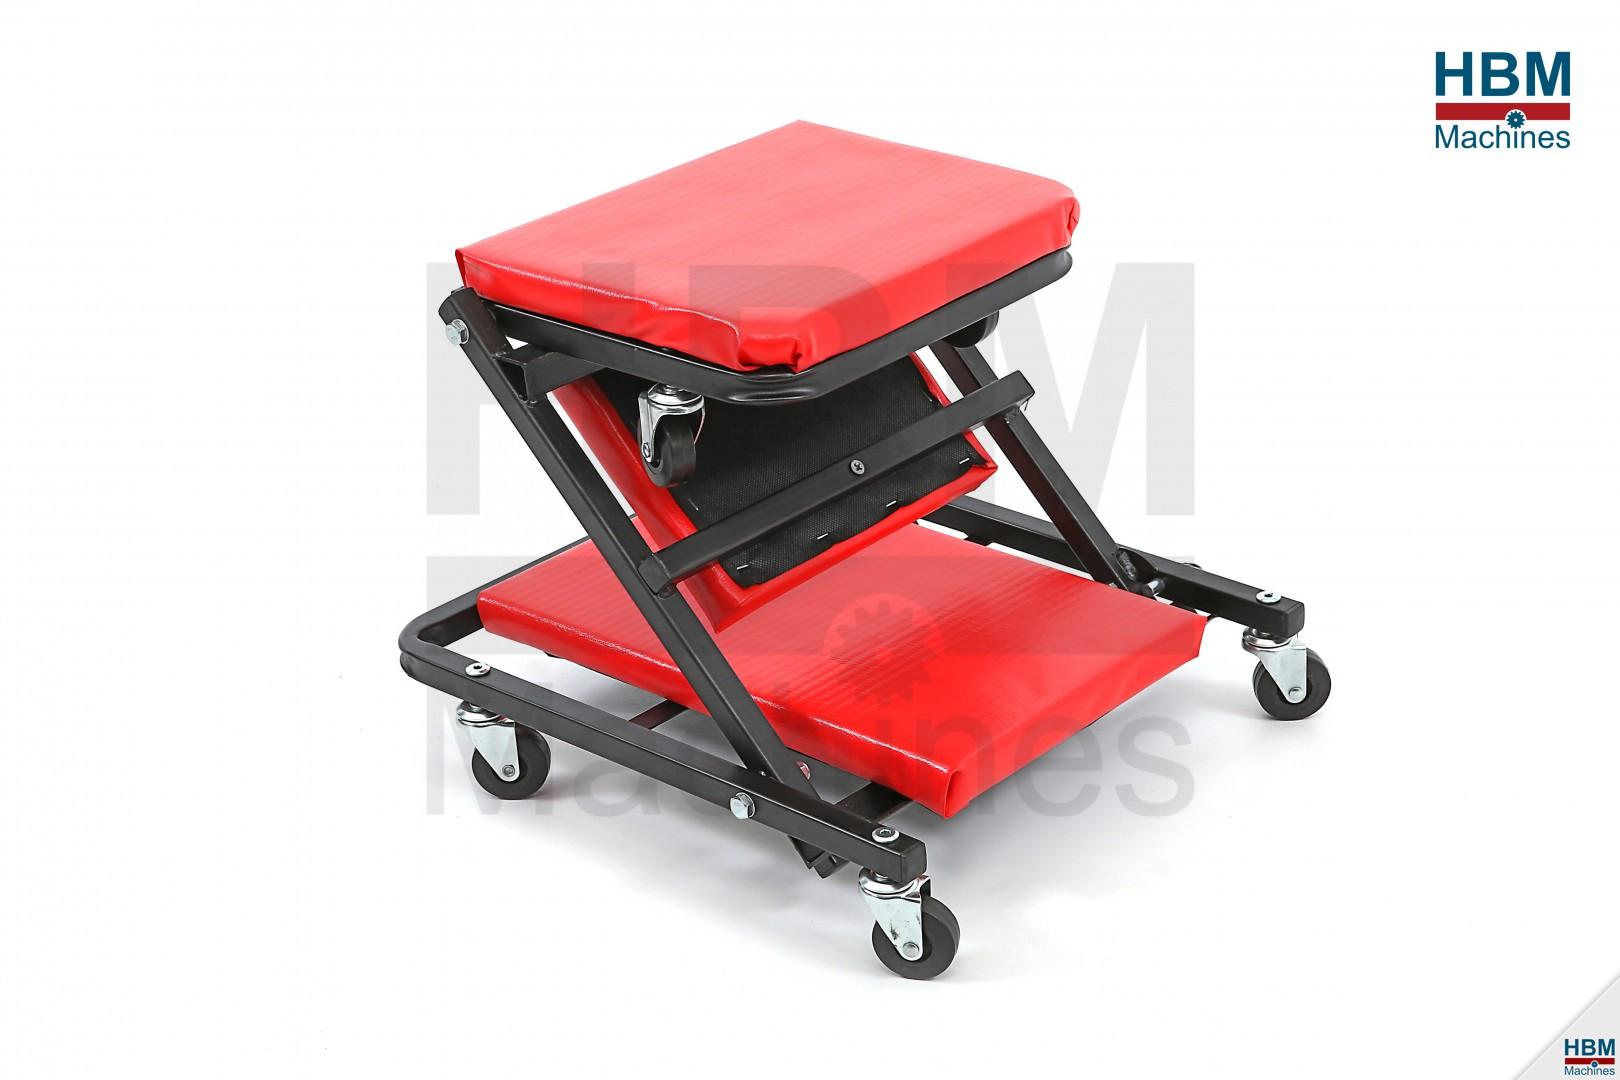 Hbm verrijdbare ligmat garage ligbed stoel hbm machines for Garage ad angers route de bouchemaine